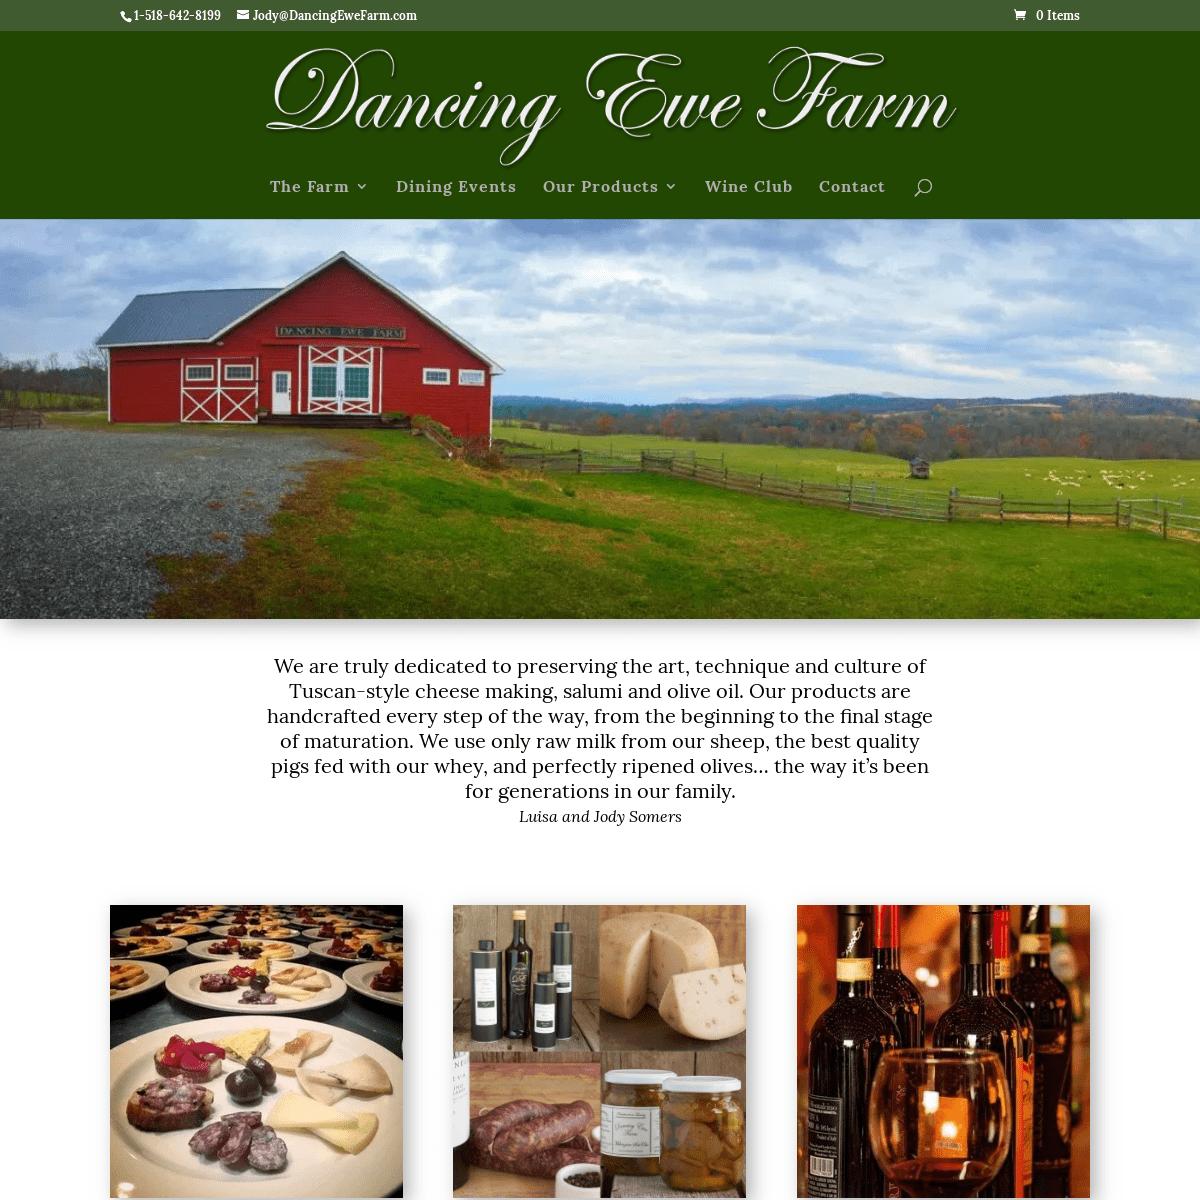 Dancing Ewe Farm – Farm to Table Dining